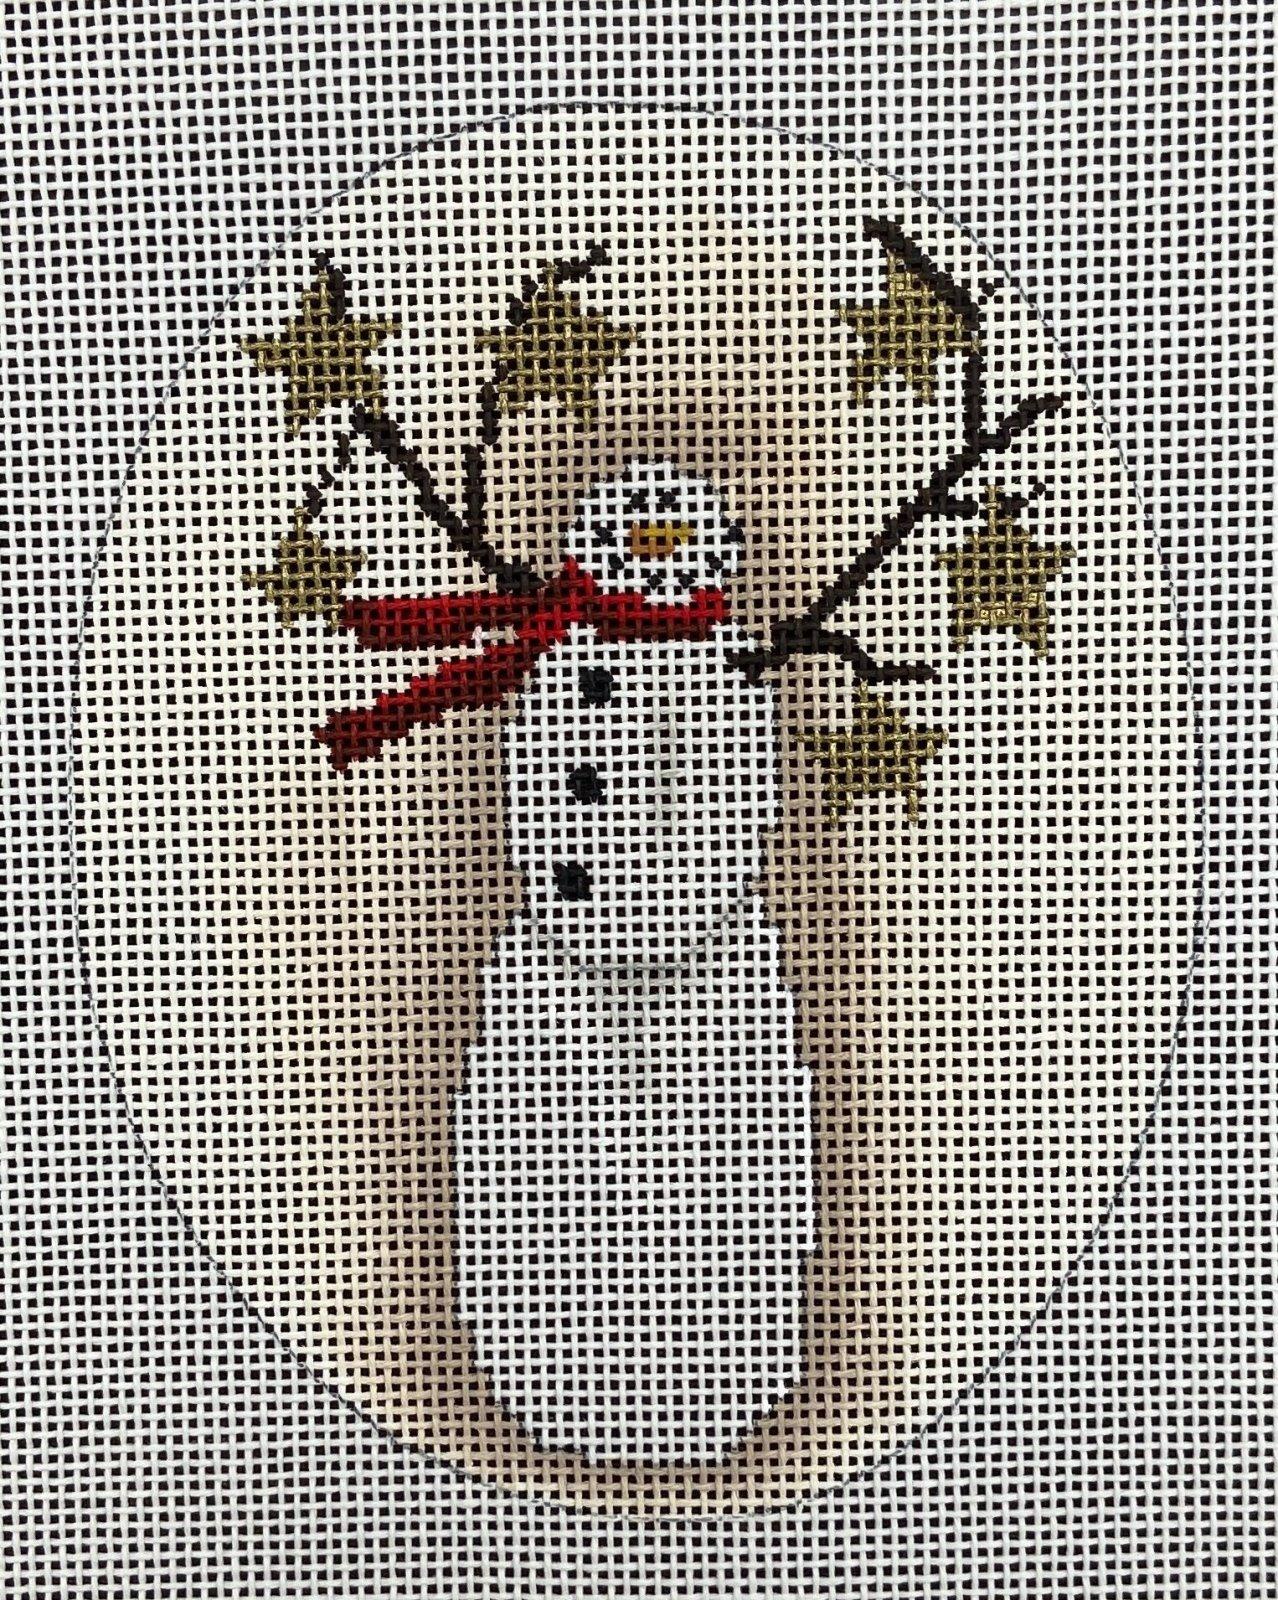 KMHXO07 Starry Snowman Ornament CBK Needlepoint Collections